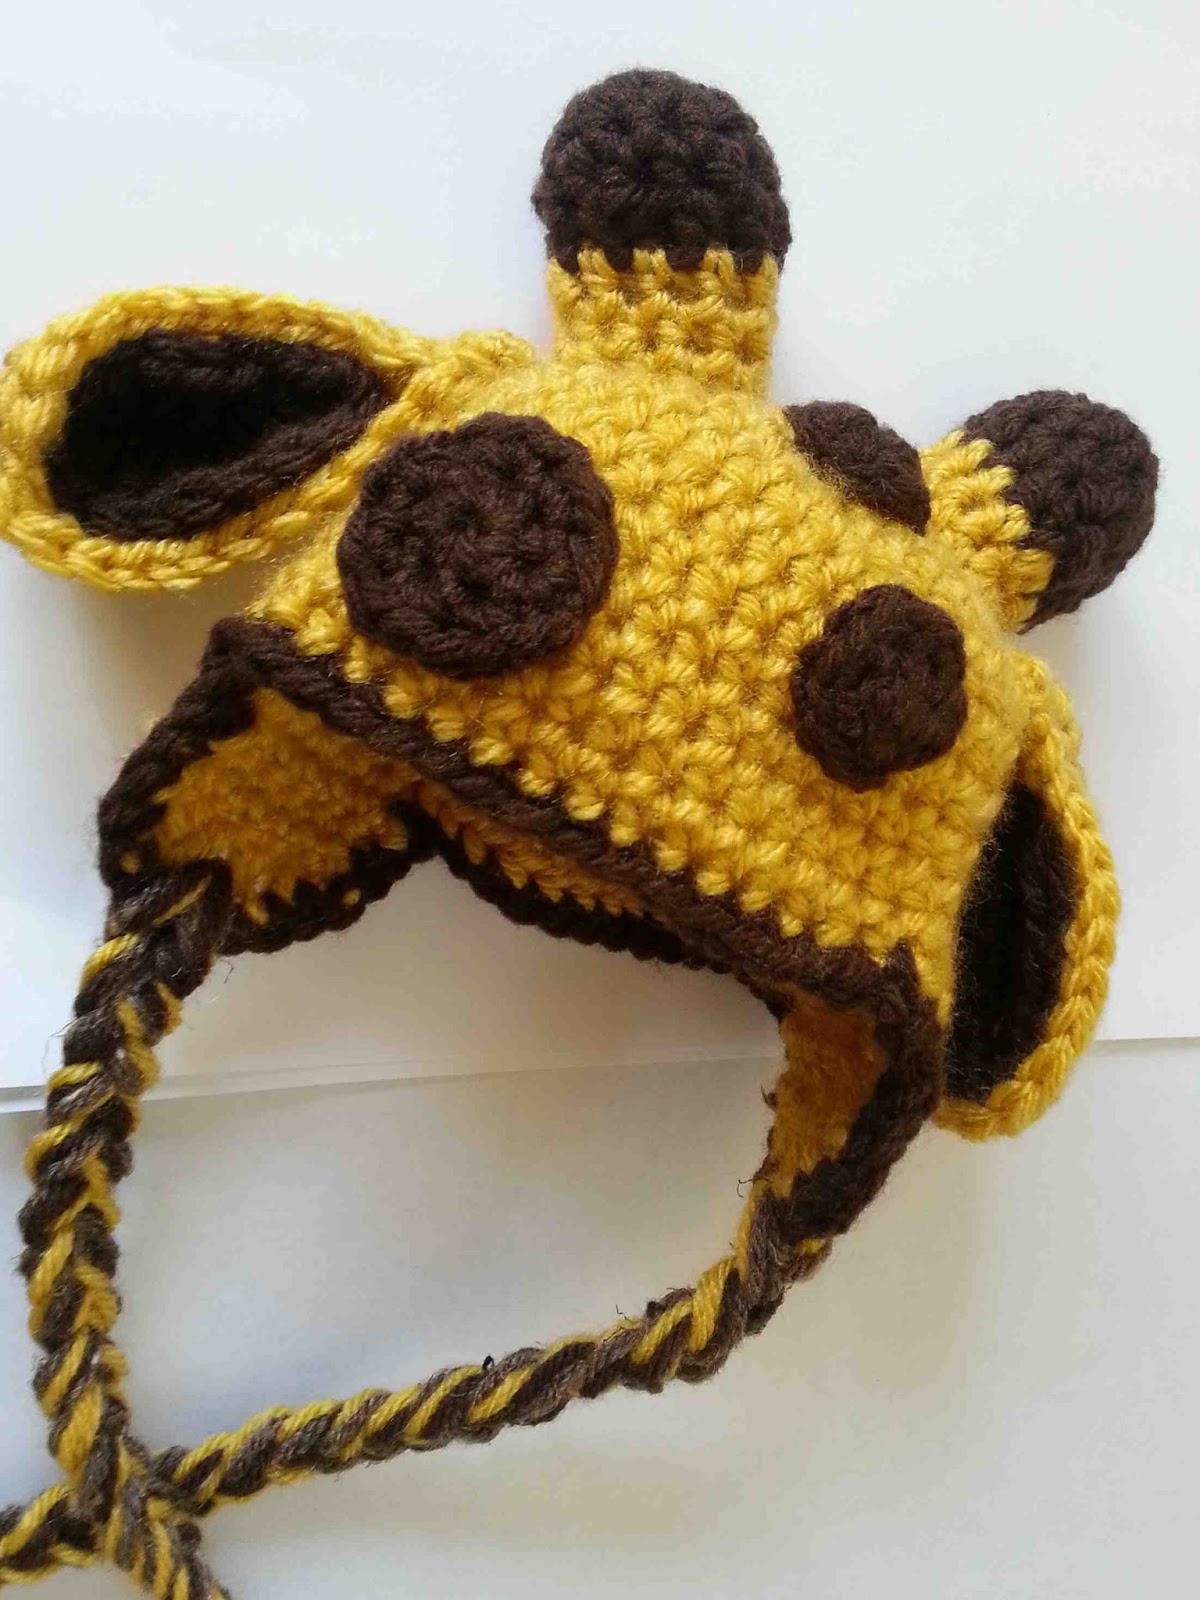 Crochet Pattern Giraffe Hat : Giraffe Hat Crochet - Viewing Gallery